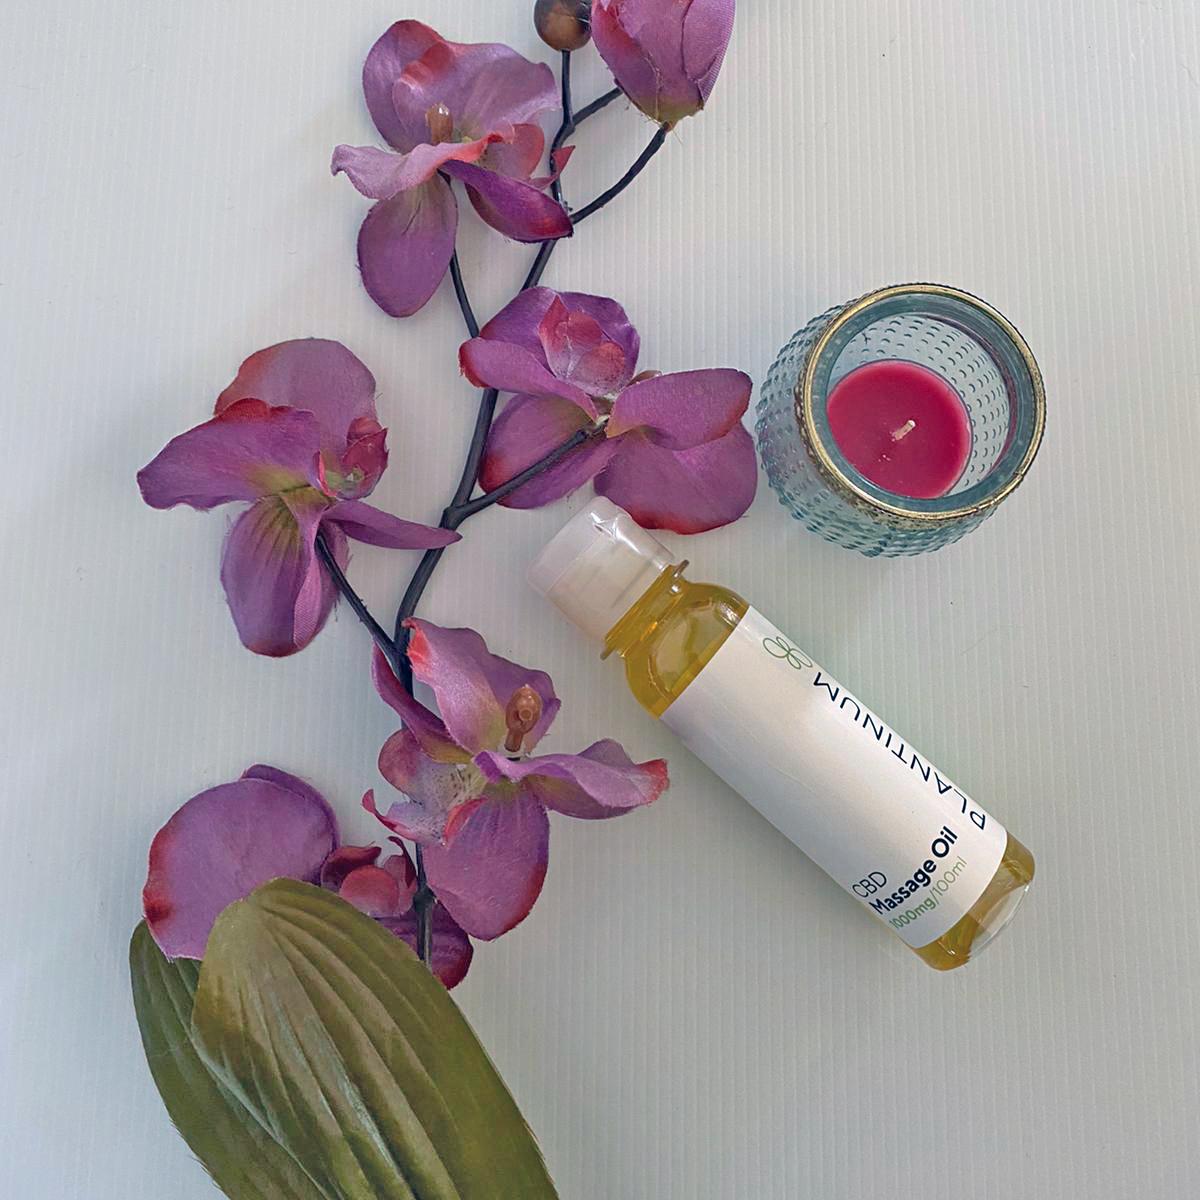 Plantinum CBD Hand Cream 100mg buy online